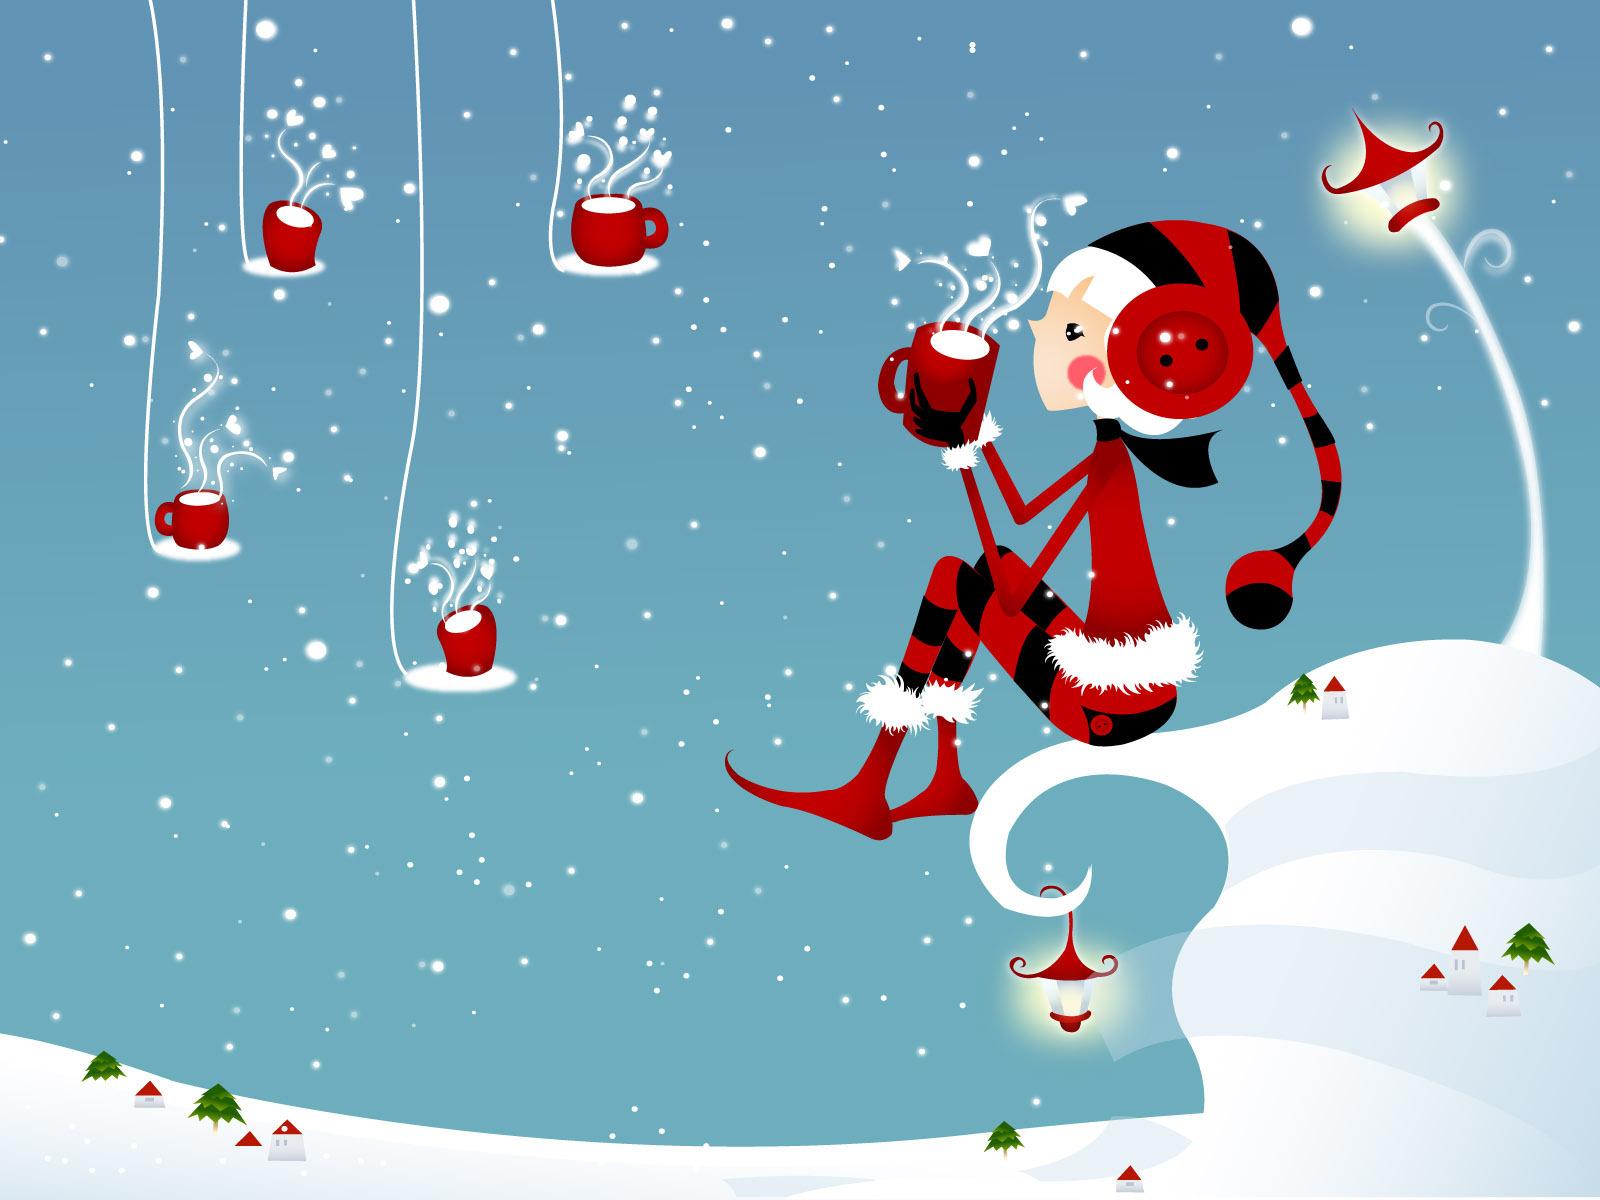 Christmas PC Wallpaper   wwwwallpapers in hdcom 1600x1200